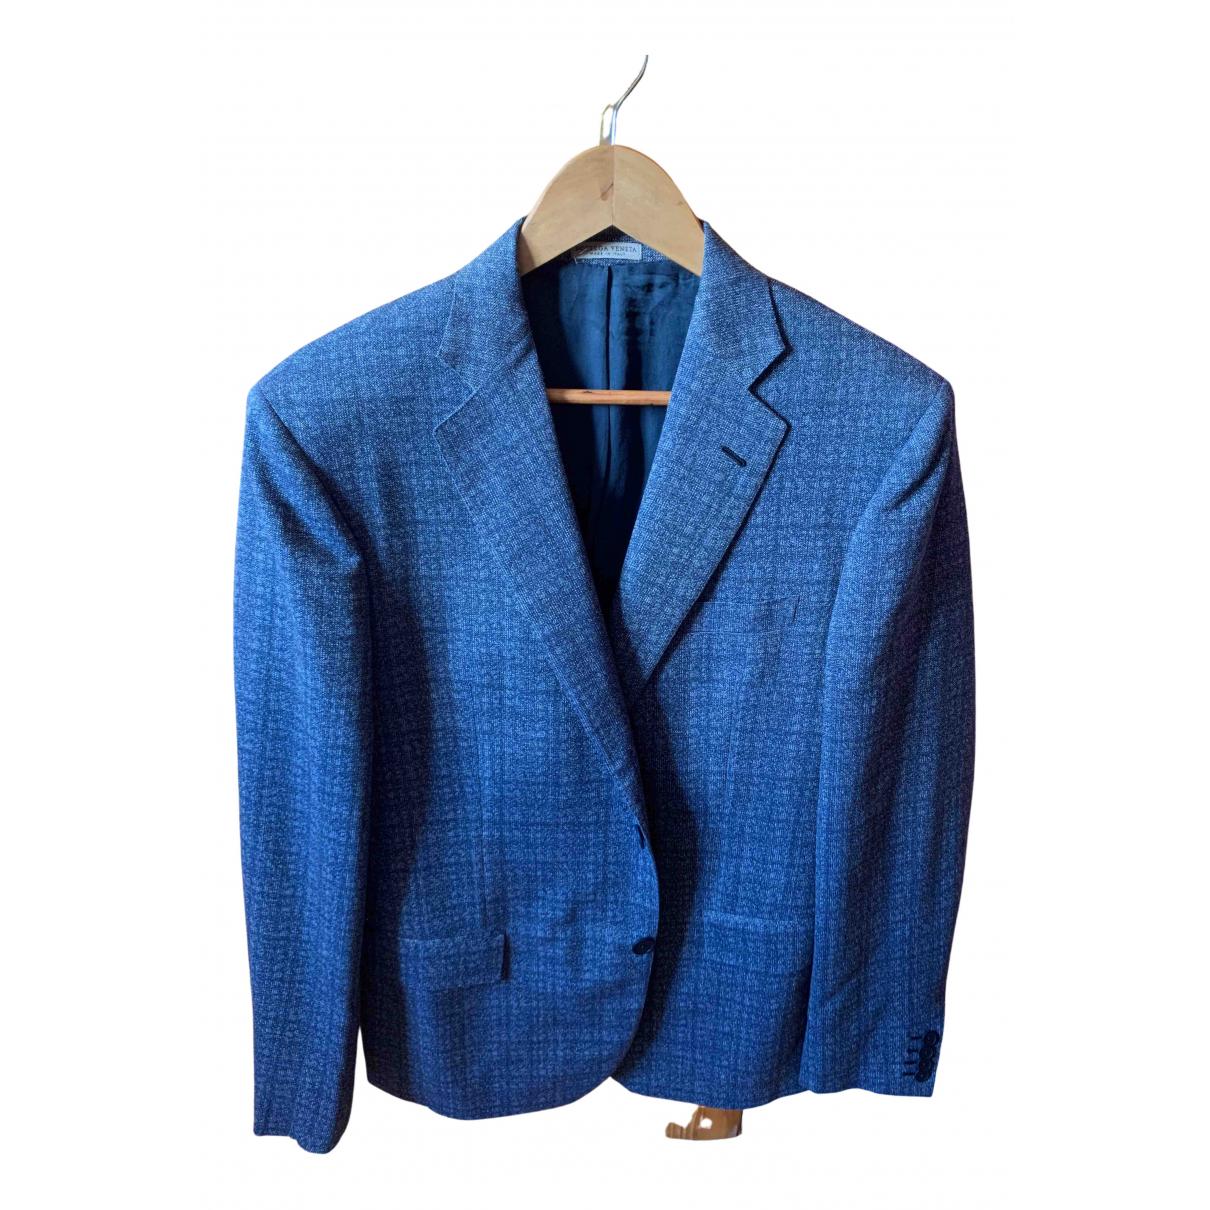 Bottega Veneta - Costumes   pour homme en laine - bleu